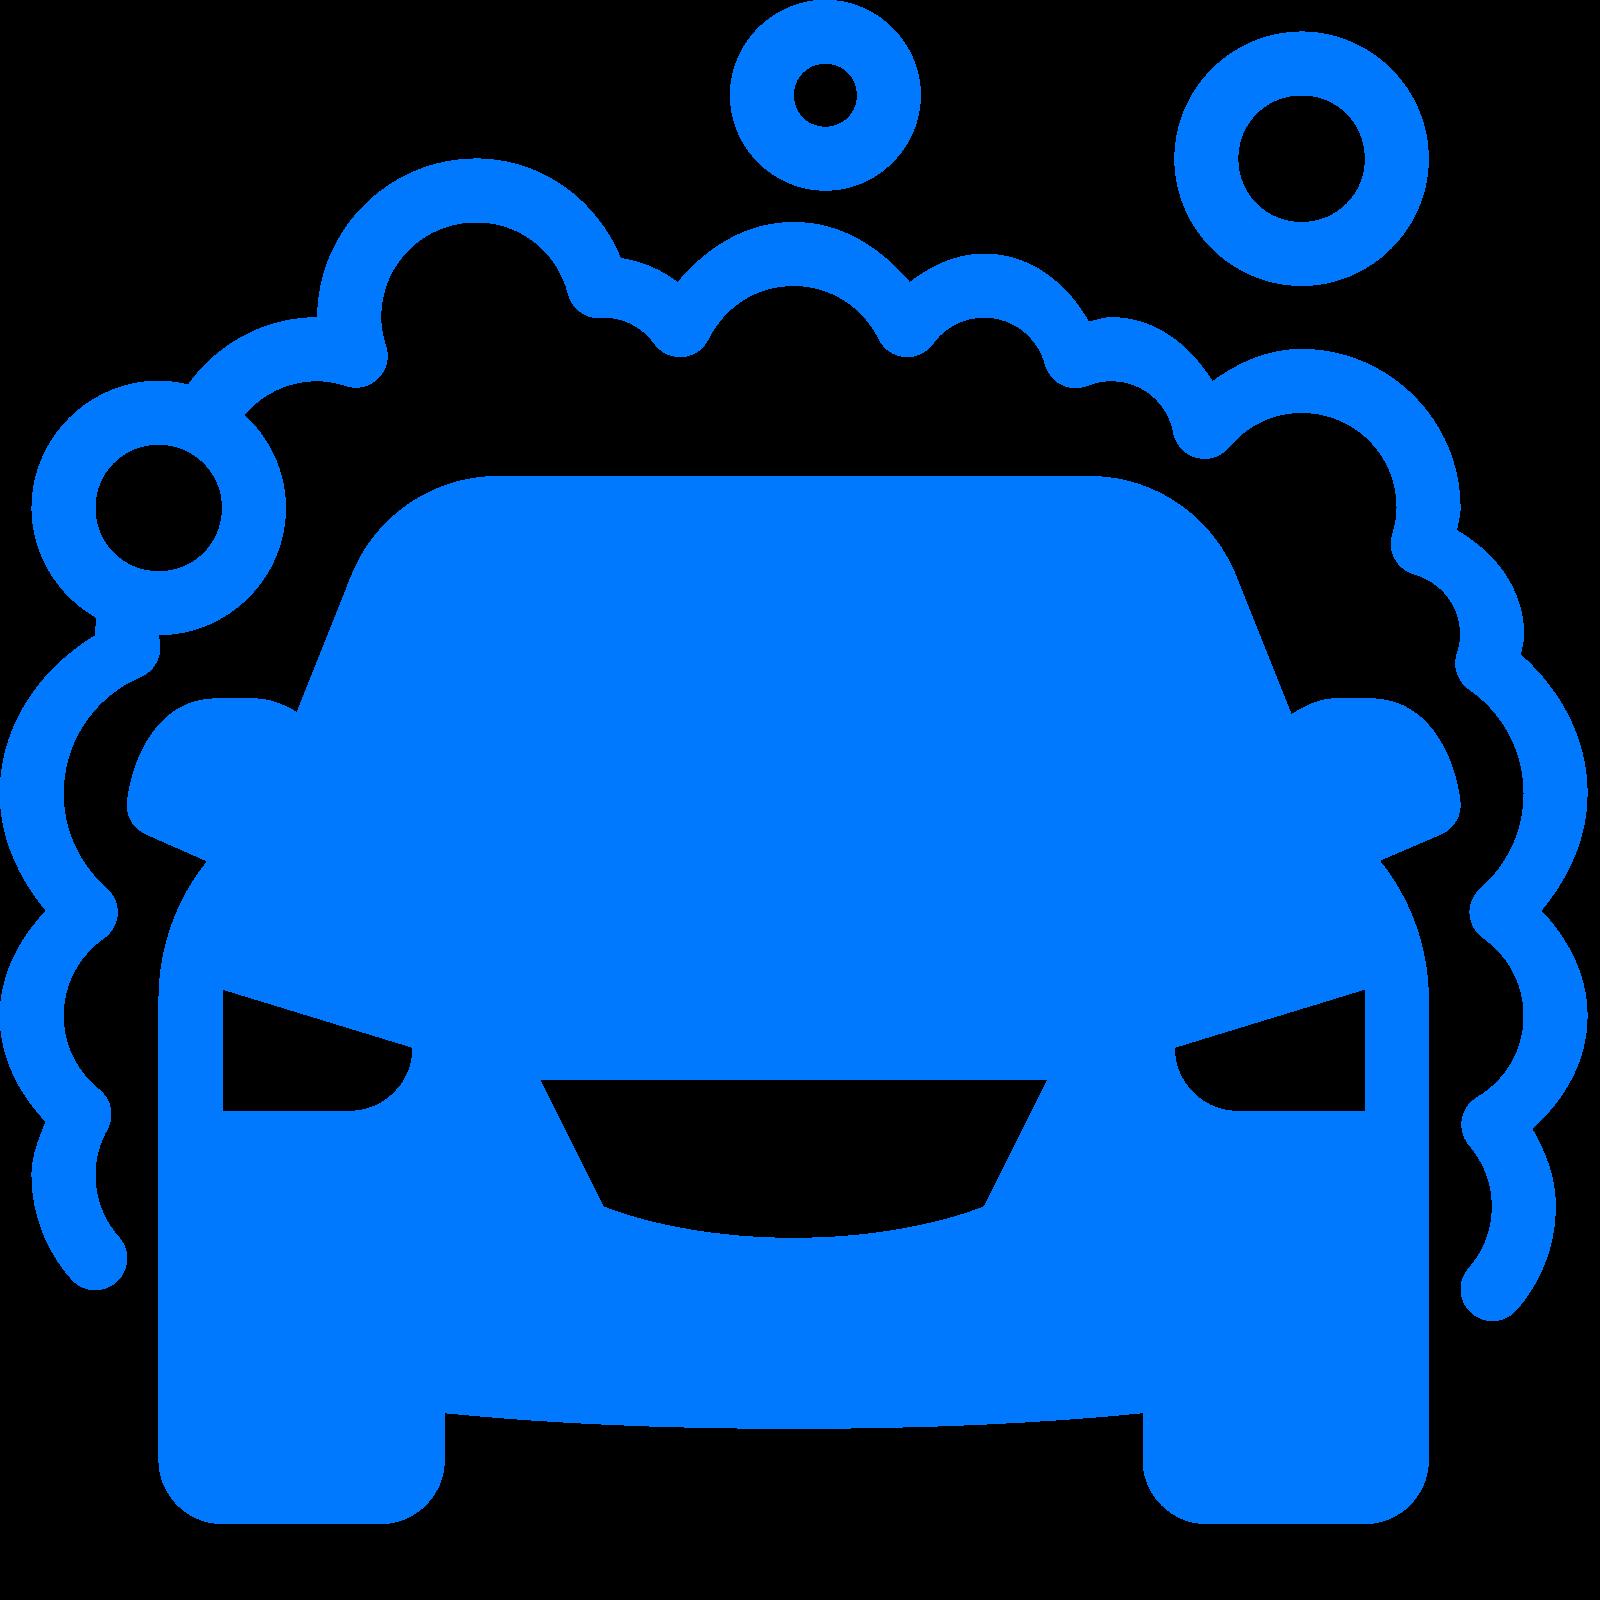 Car wash graphics clipart svg freeuse download Car wash Auto detailing Computer Icons Clip art - car wash 1600*1600 ... svg freeuse download